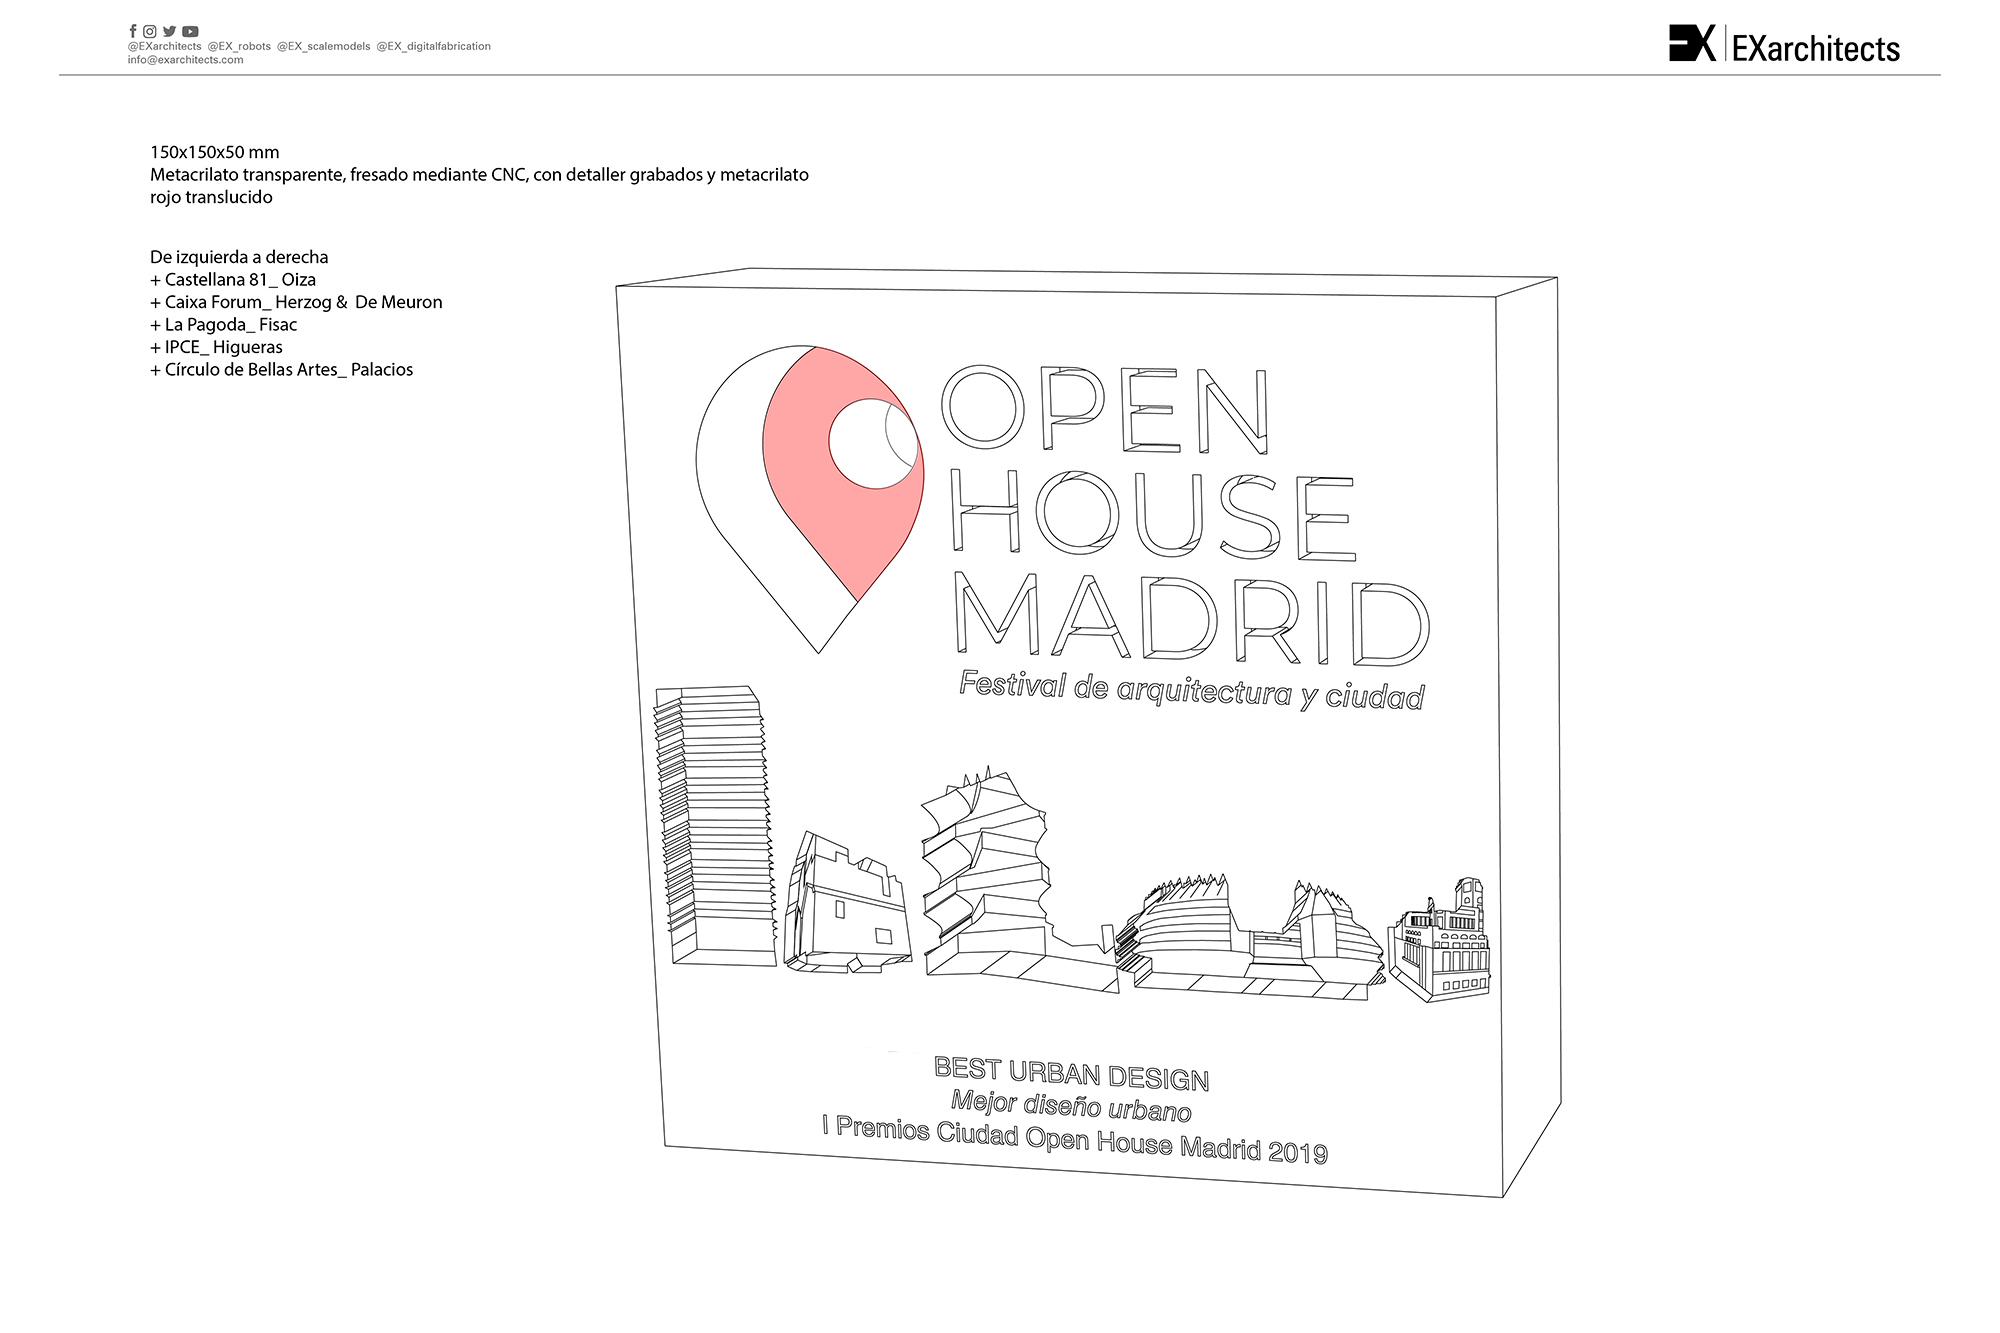 Premios-Ciudad_-Open-House-Madrid_-Diseño-_-EXarchitects_09